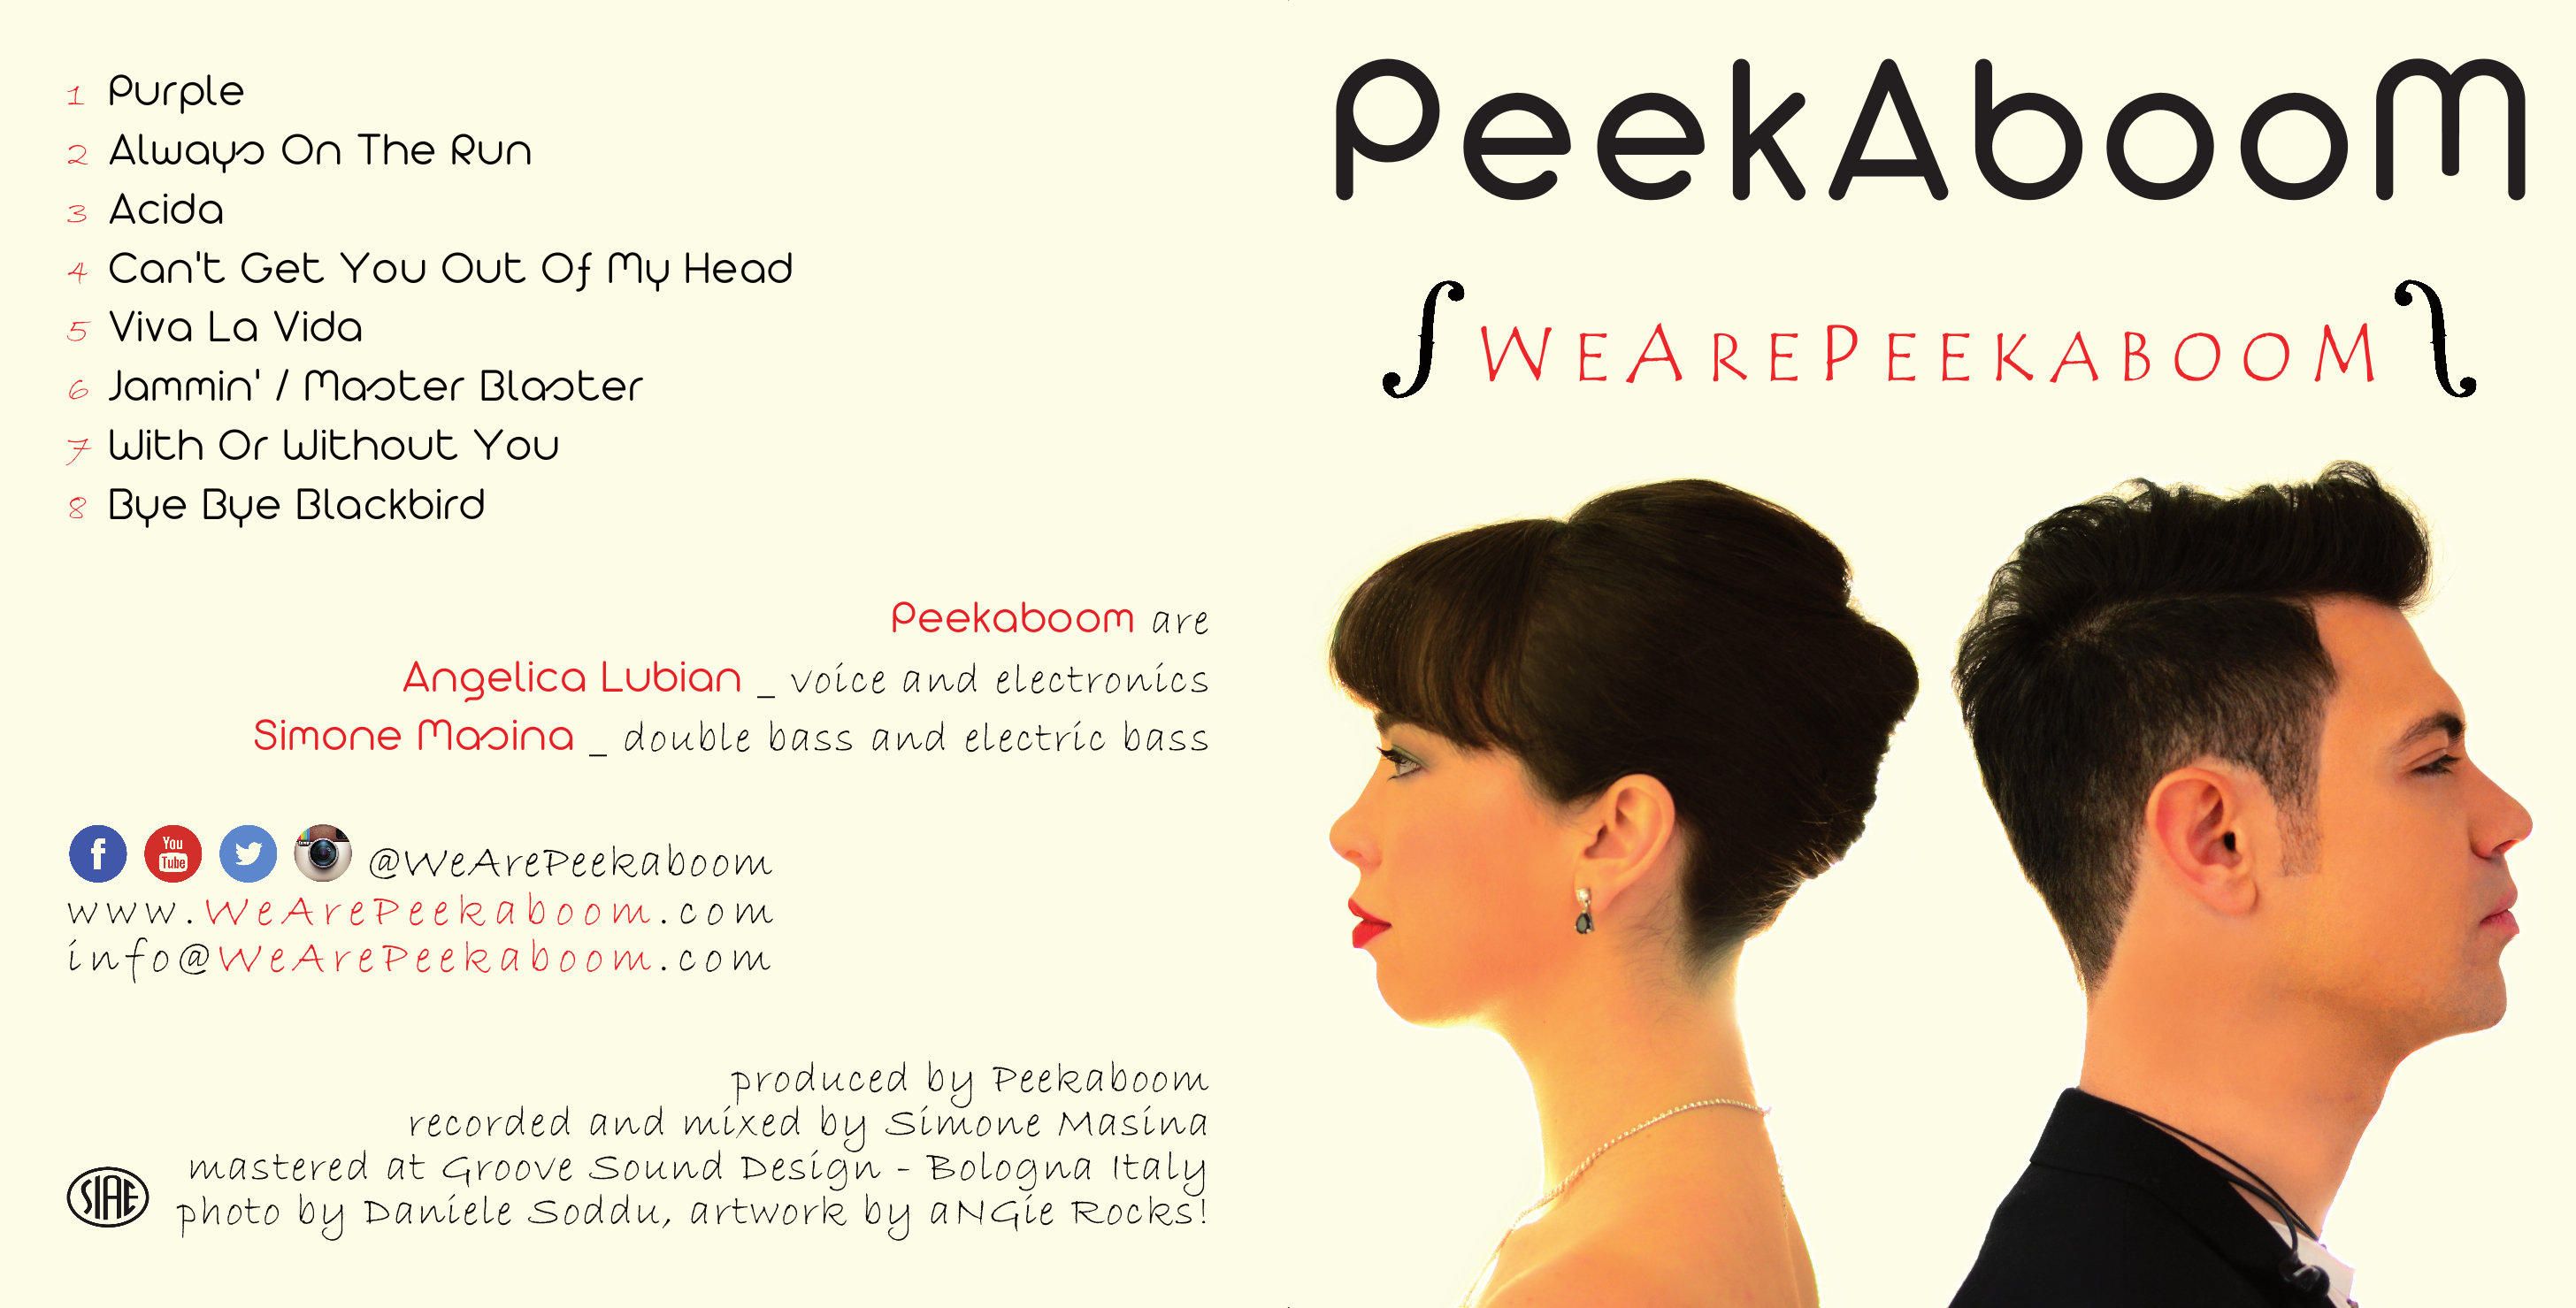 We Are Peekaboom - Digital Download MP3 + PDF